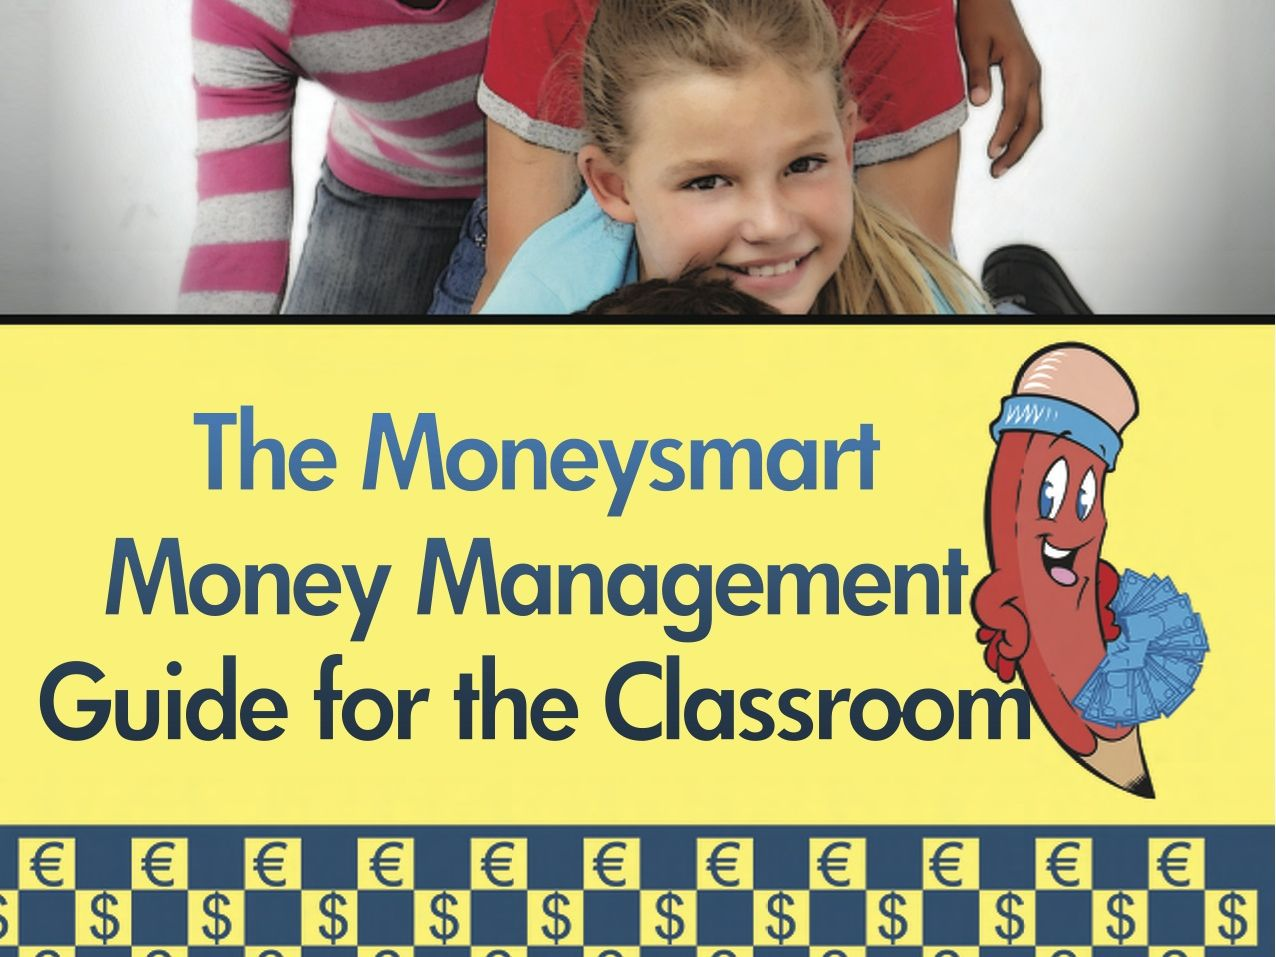 Money Lesson Plans for Key Stage 1 (KS1)